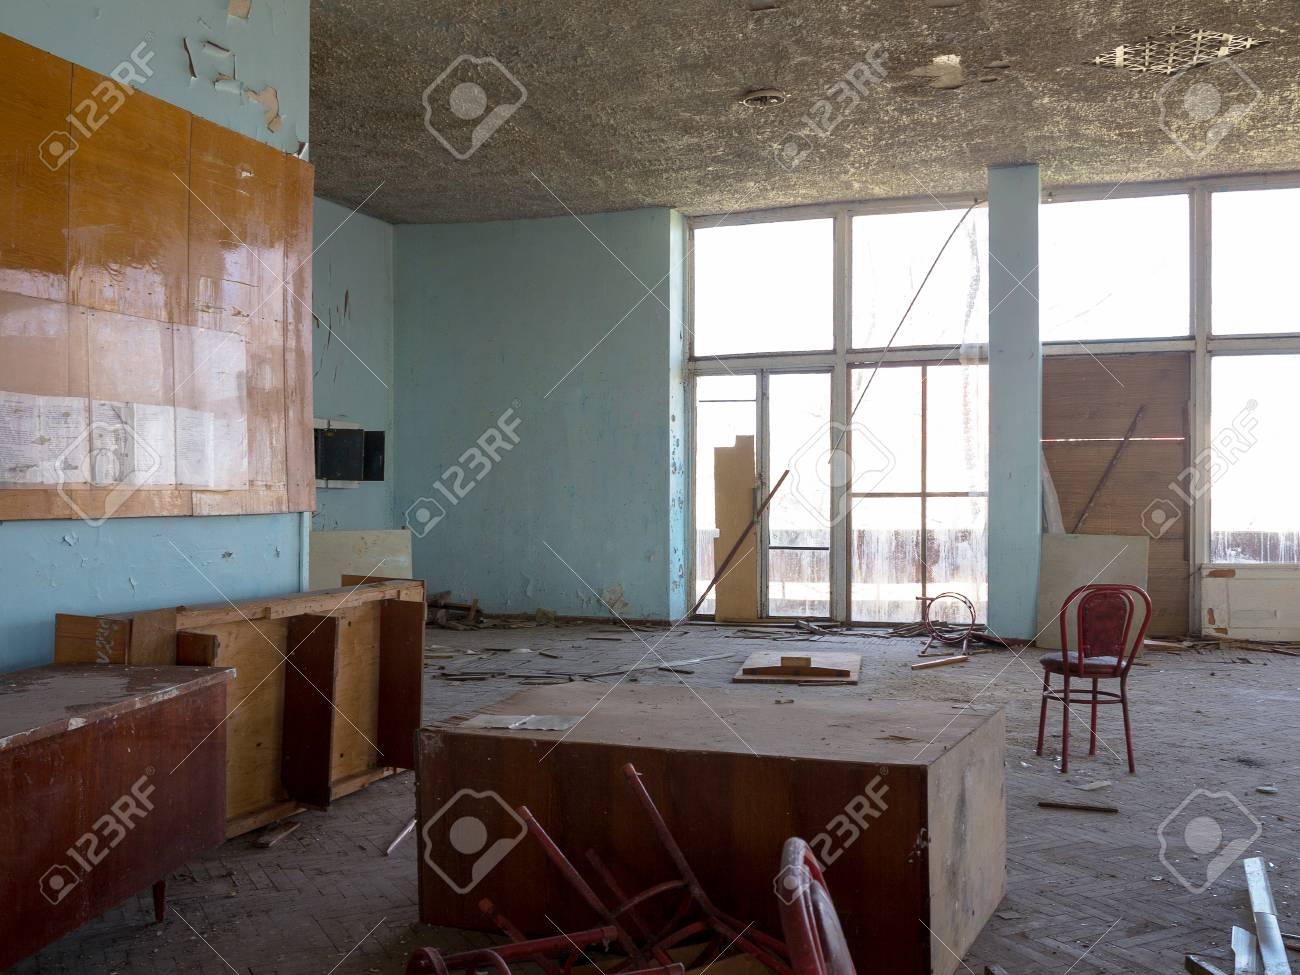 cinema room furniture. Old Furniture Scattered Around The Room. Interior Details Inside Destroyed House Of Culture. Cinema Room F